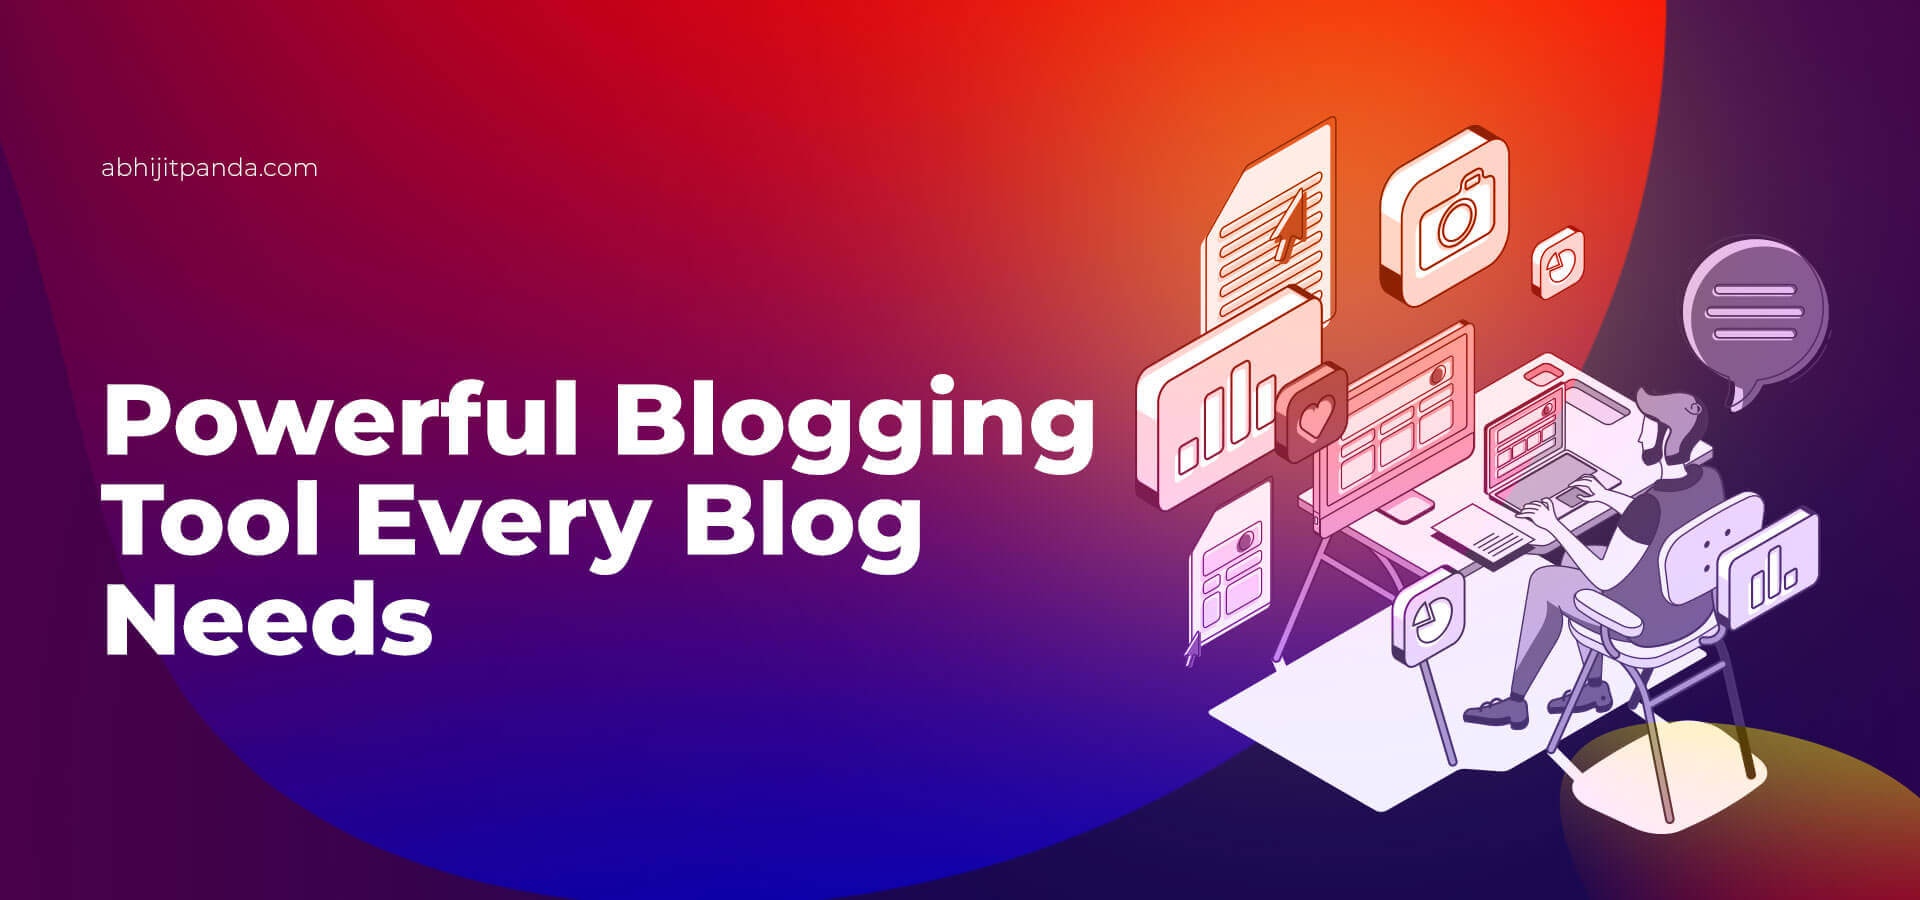 Best Blogging Tools & Resources